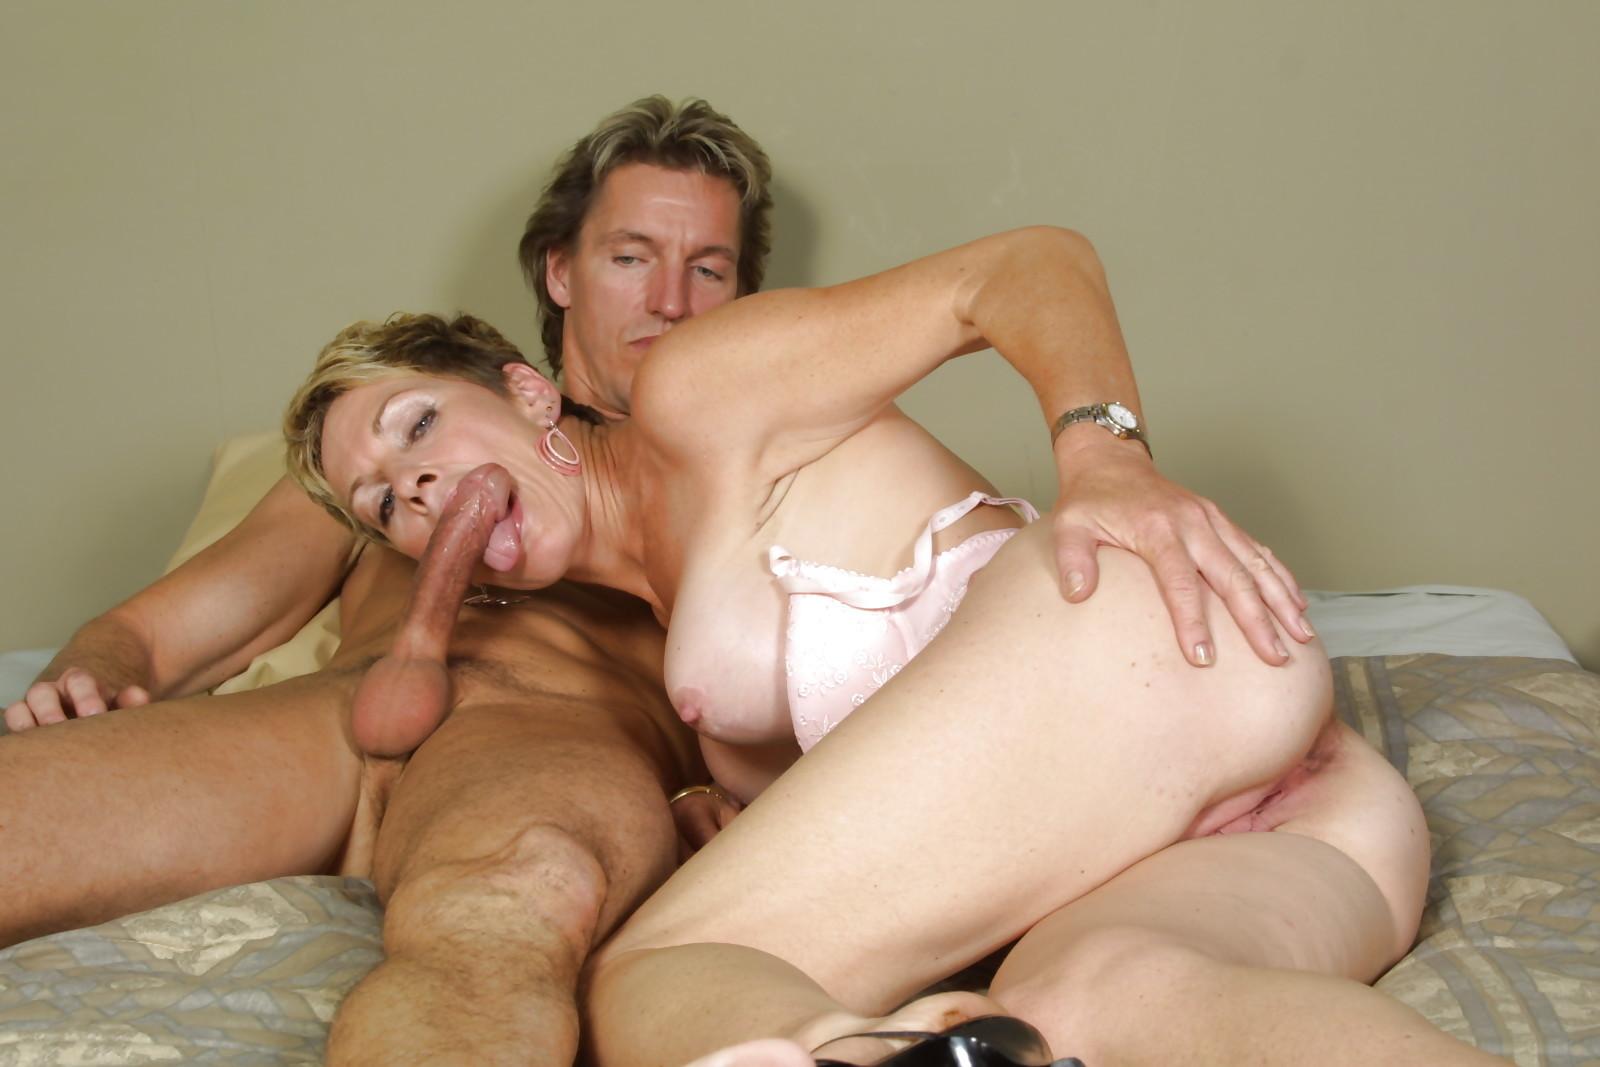 Секс со зрелой теткой фото 5 фотография